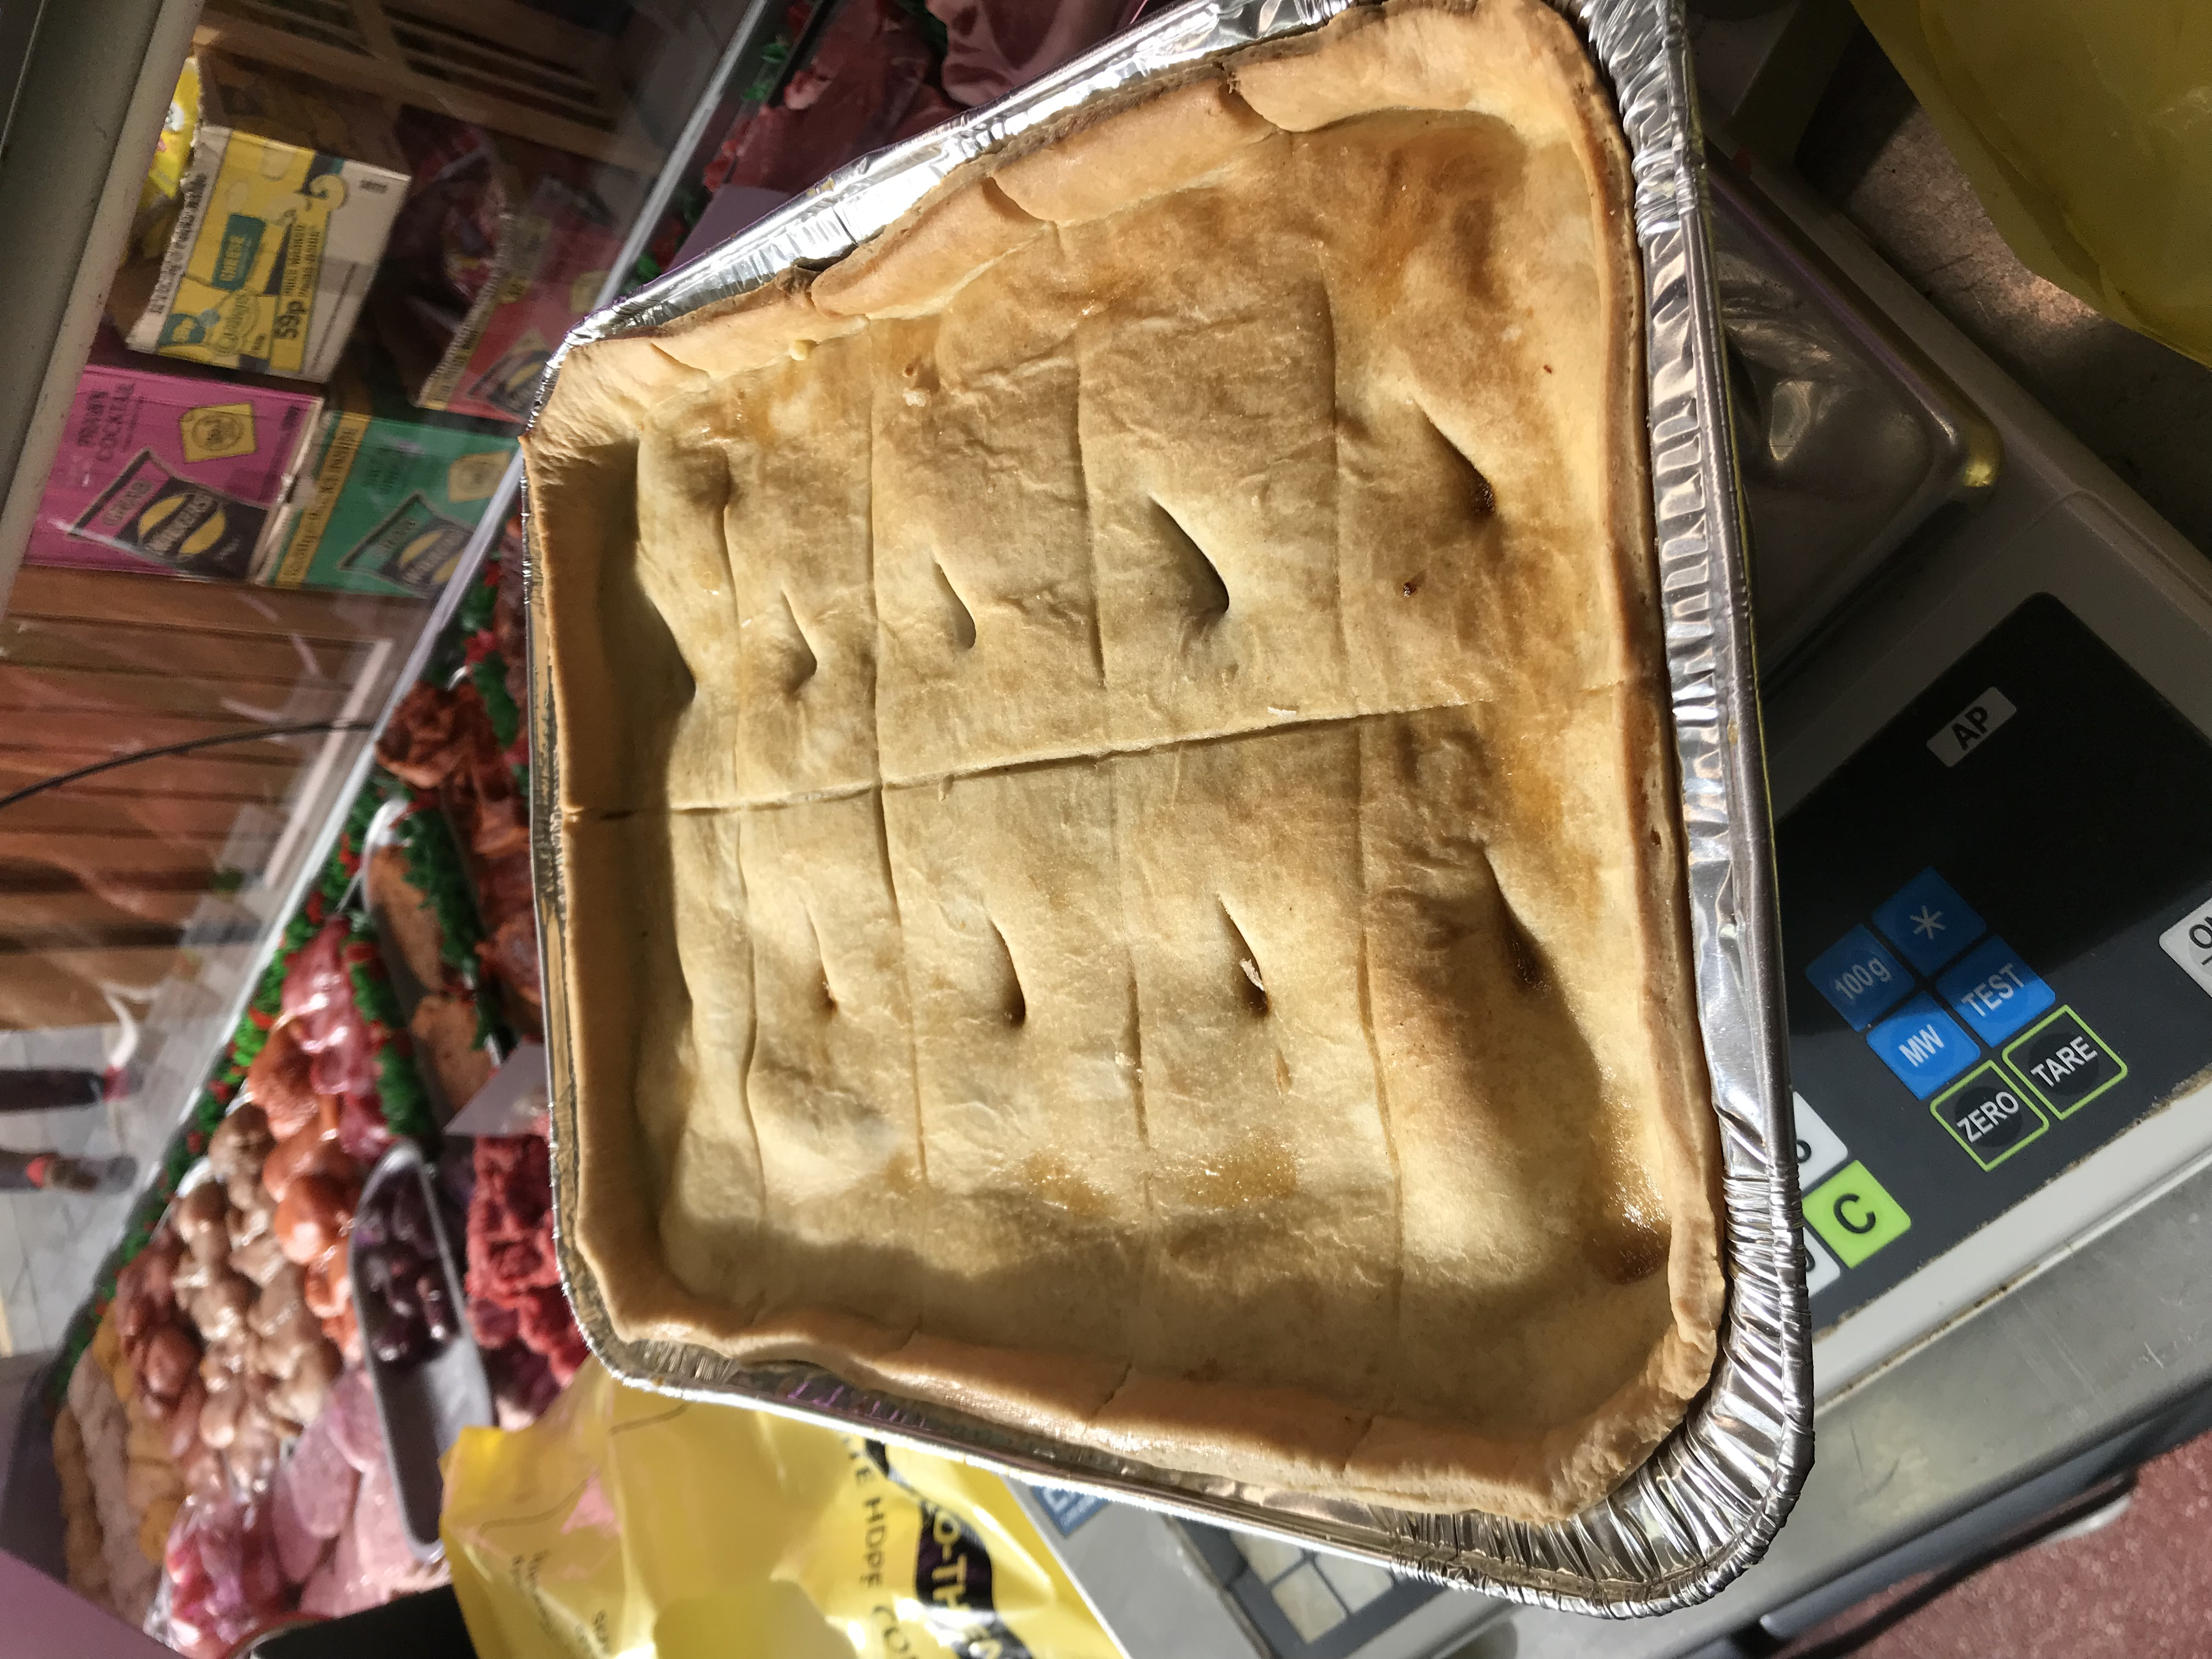 Party size meat n potato pie - DH Lees